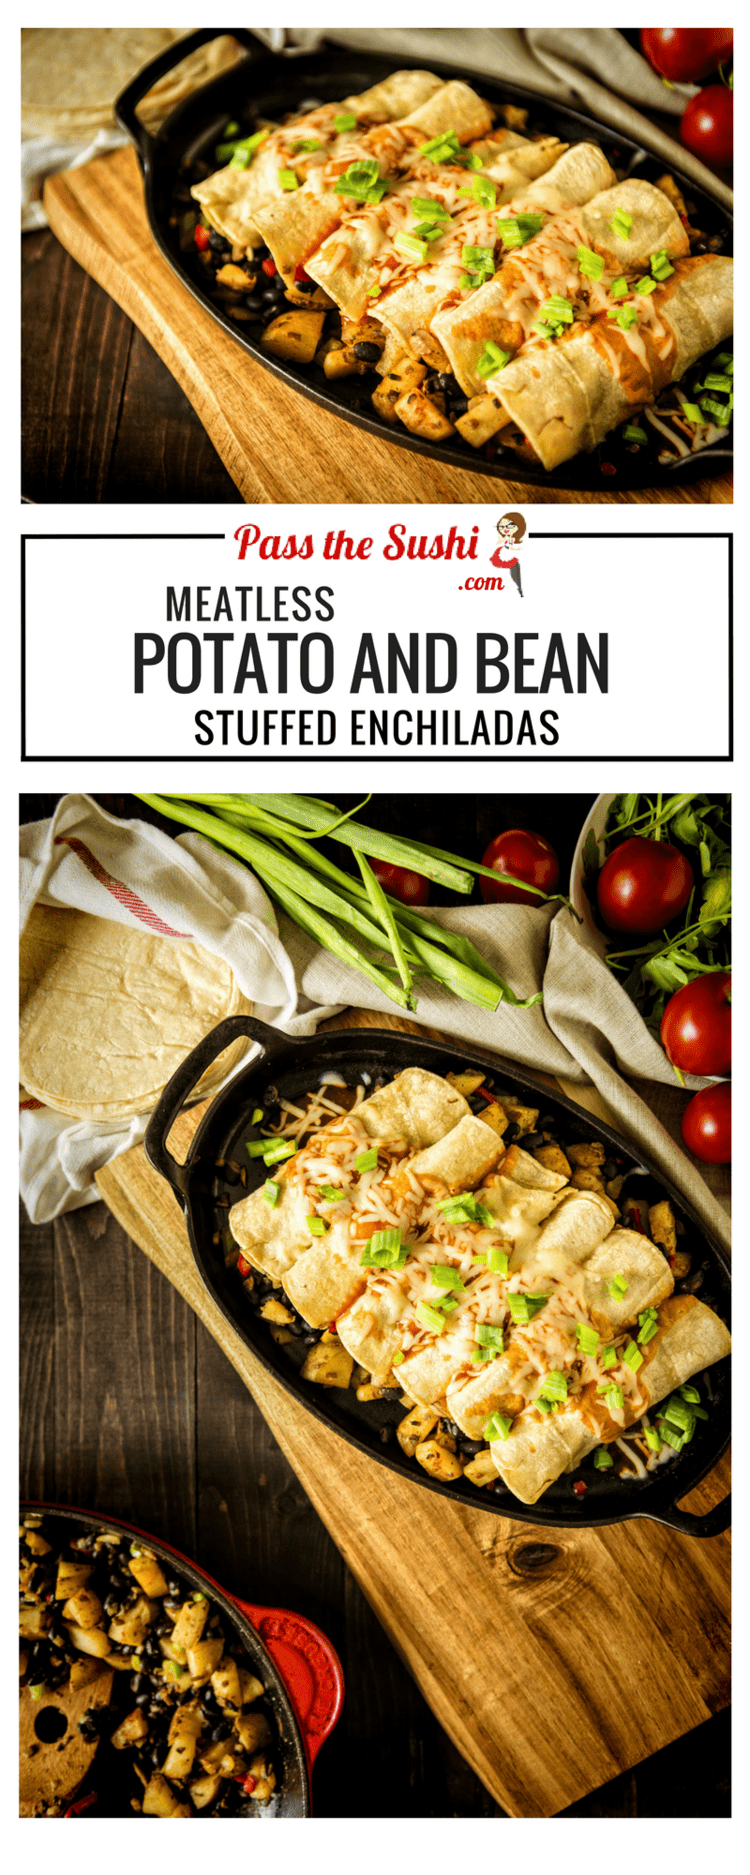 30 Minute Meatless Potato and Bean Enchiladas | Recipe at PasstheSushi.com